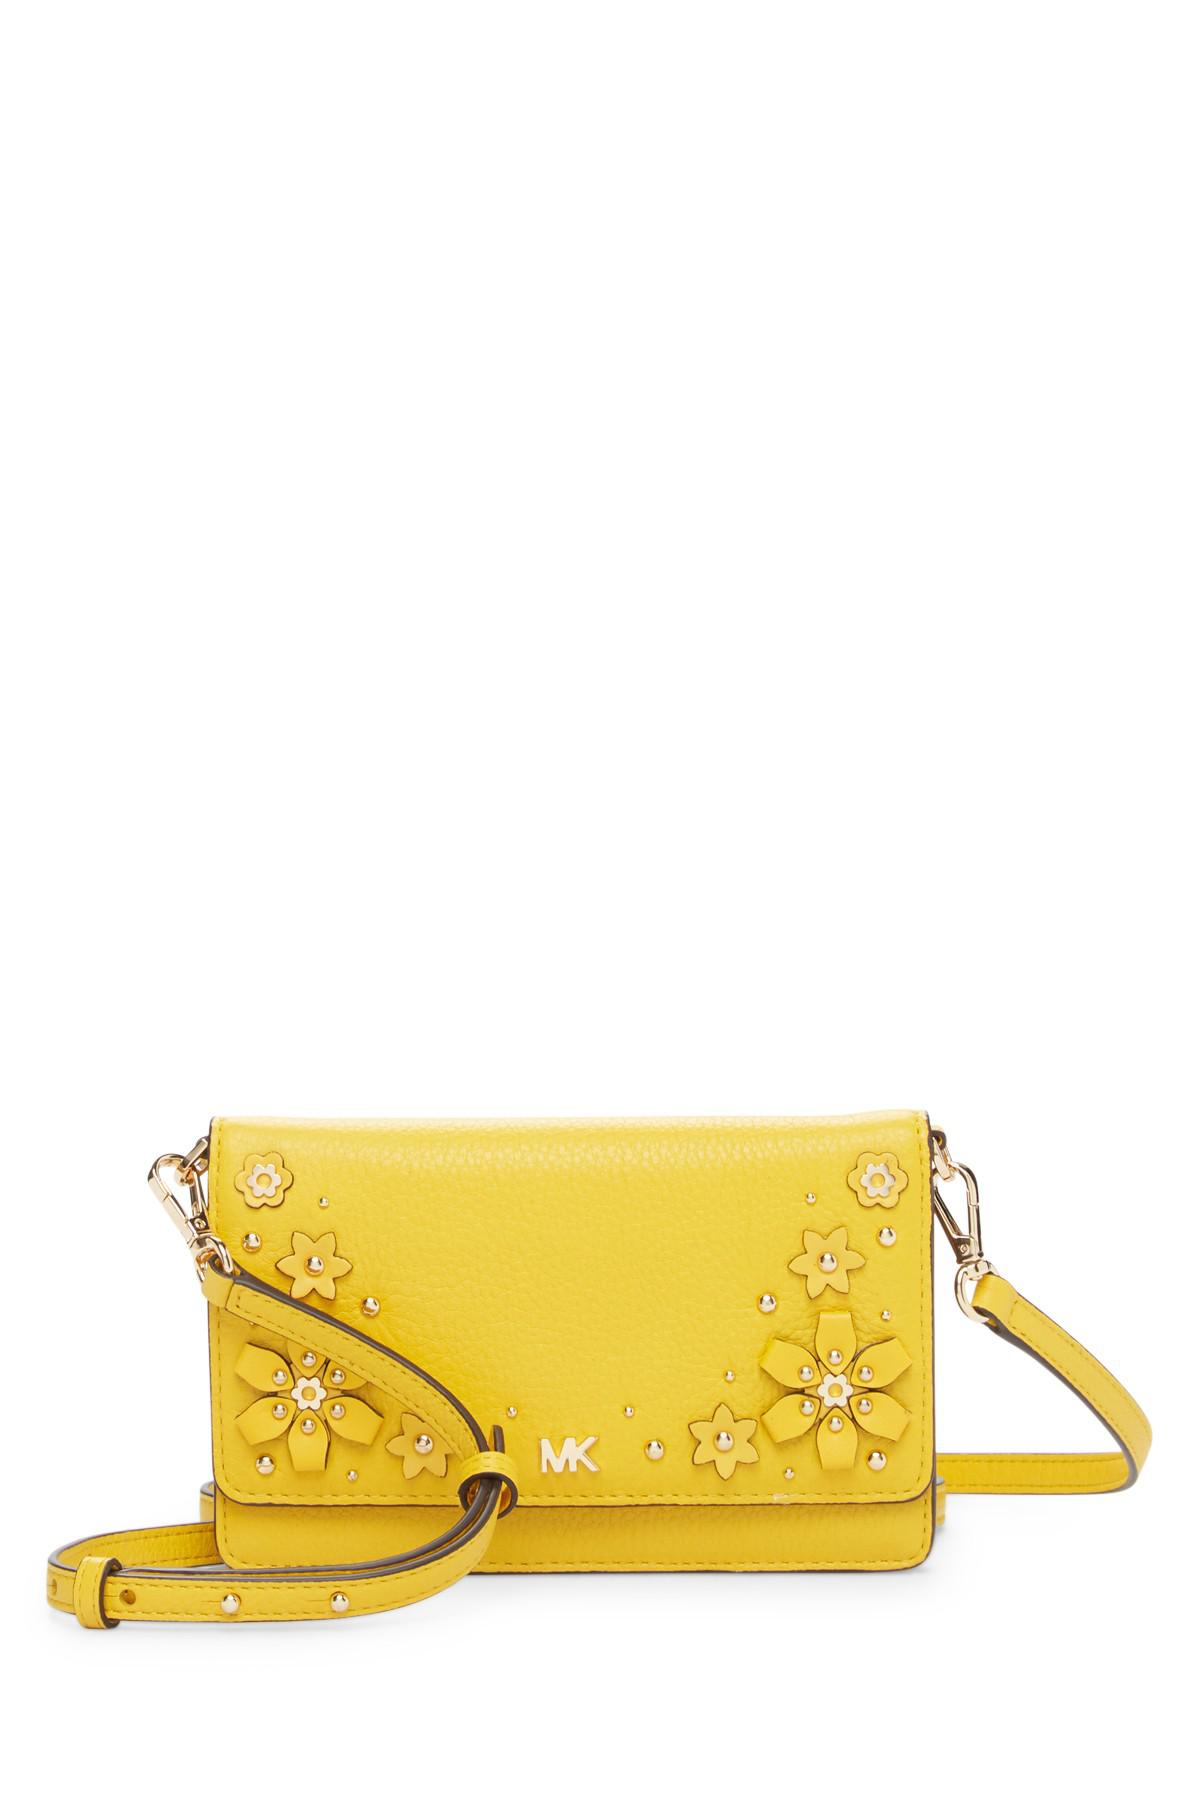 d199e4469e11 MICHAEL Michael Kors Floral Embellished Leather Phone Crossbody Bag ...